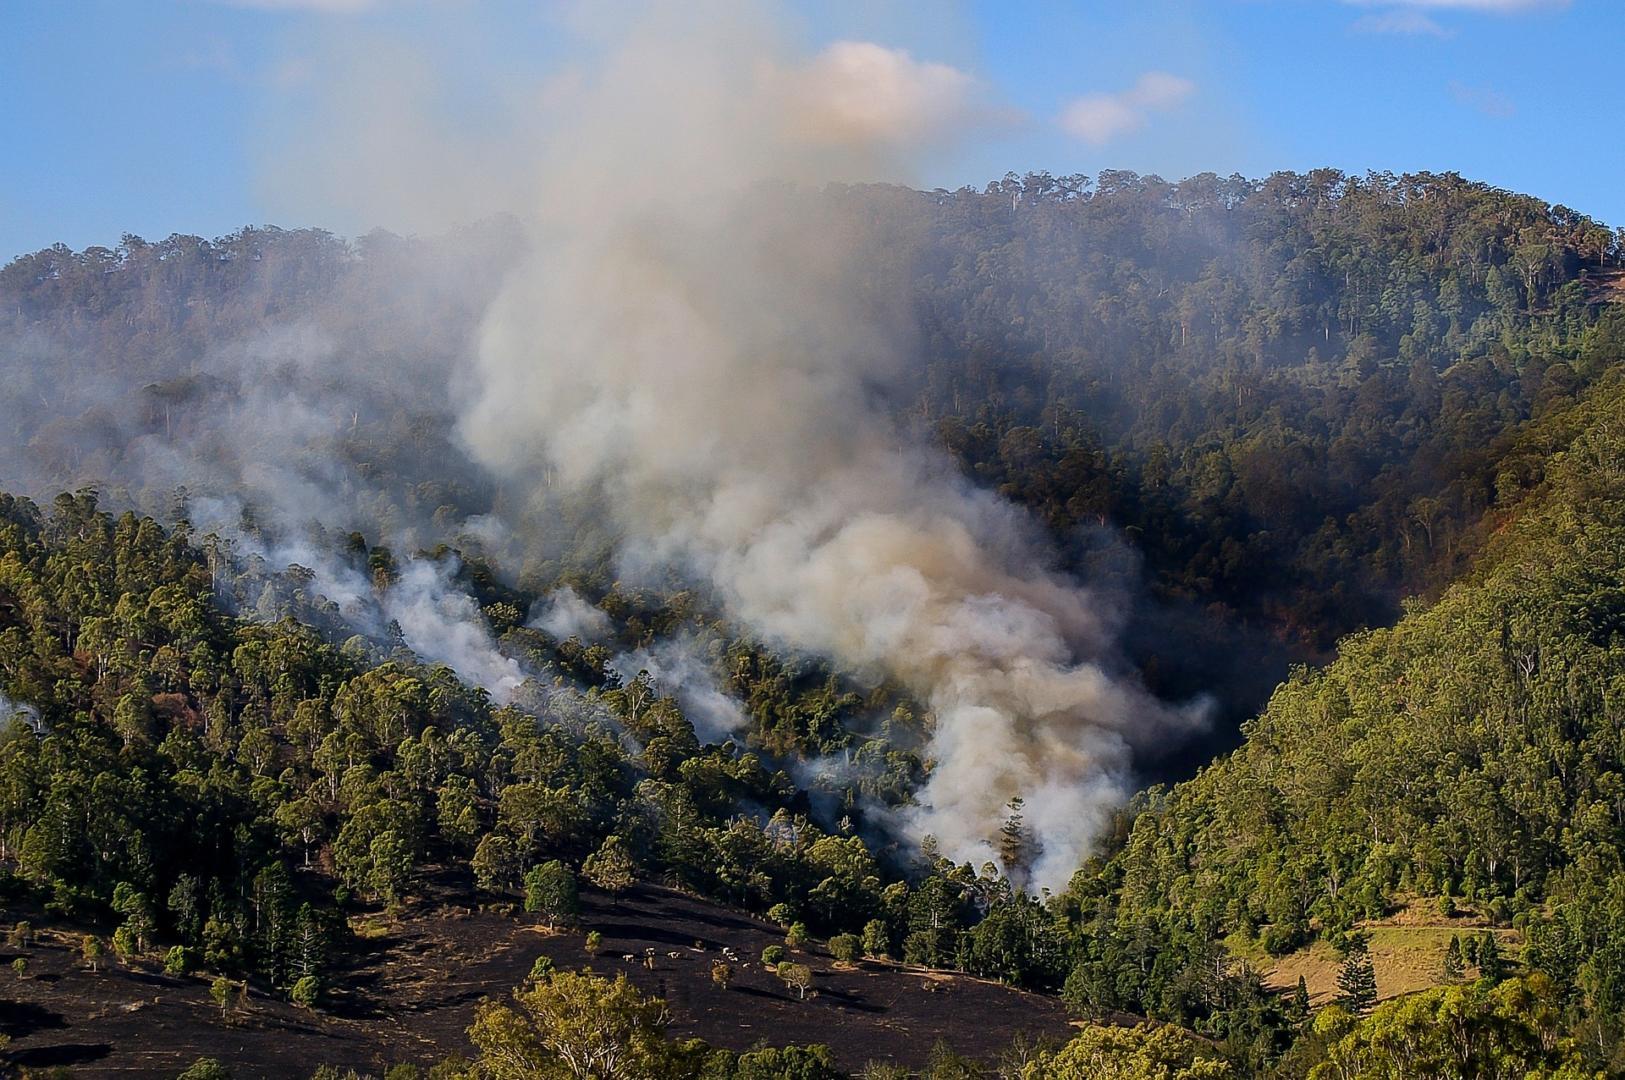 How to prepare for bushfire season - Bushfires can more quickly. Be prepared, Australian Outdoor Living.